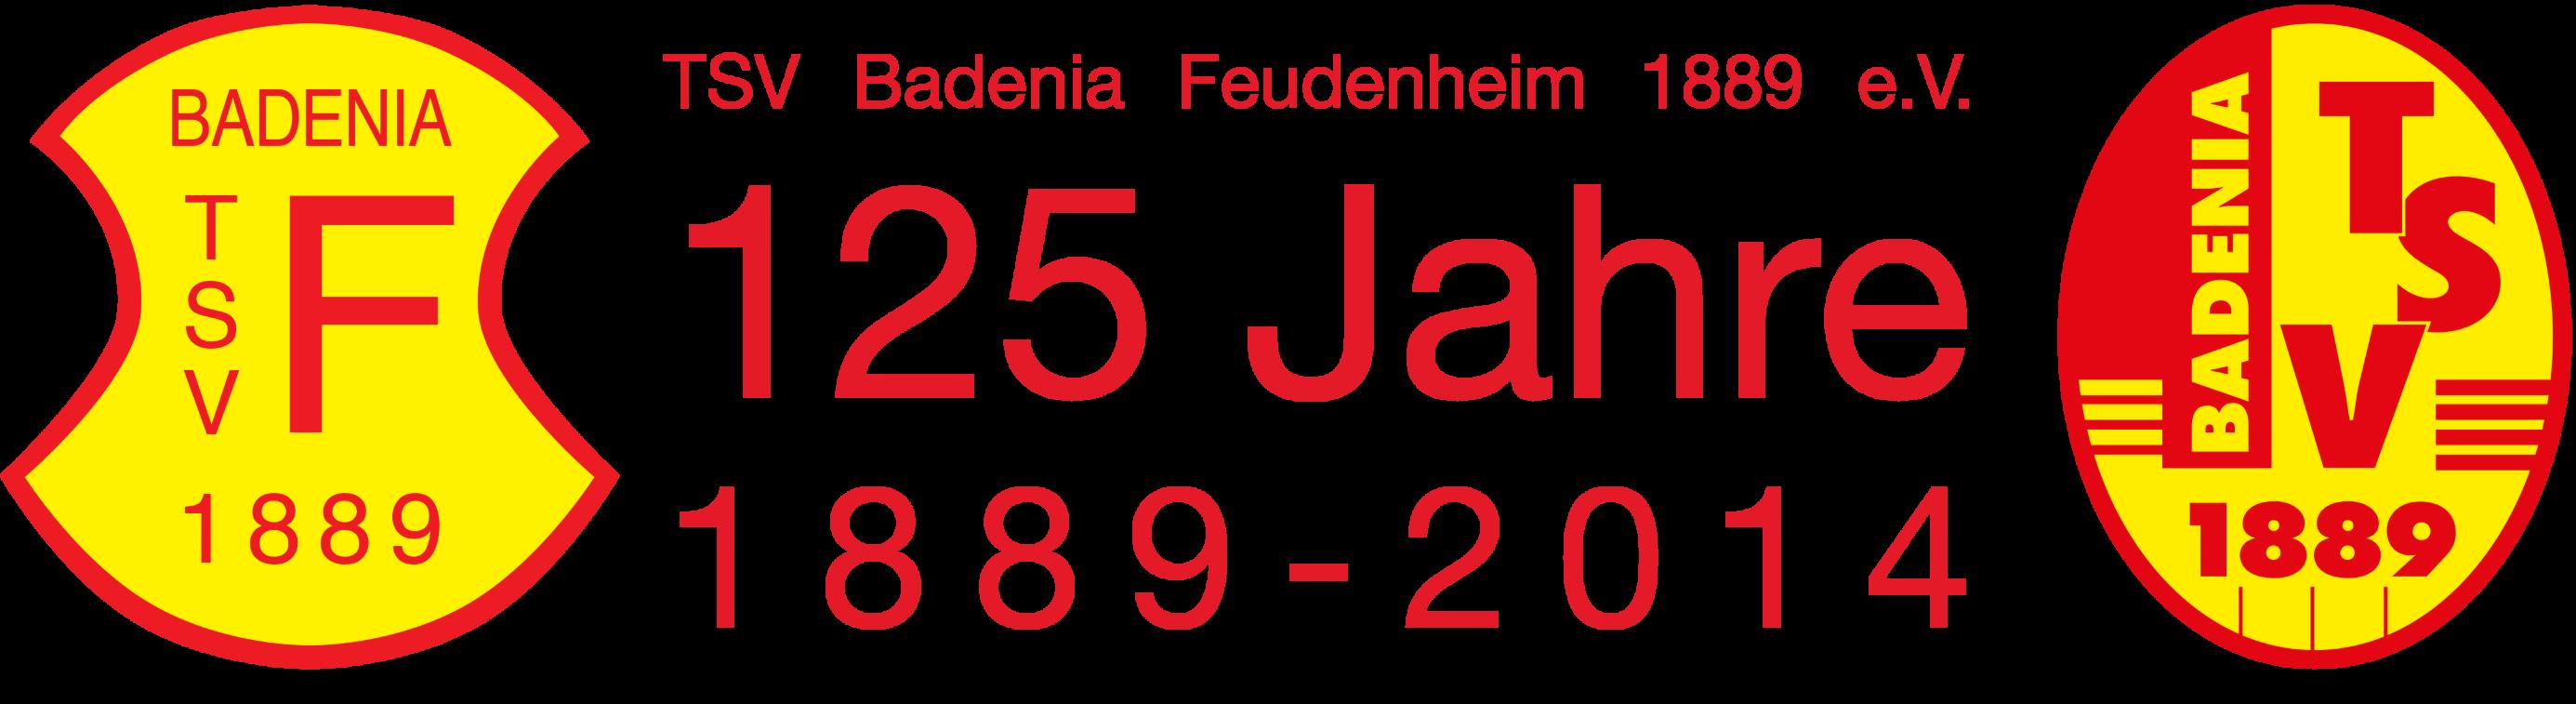 Badenia Feudenheim